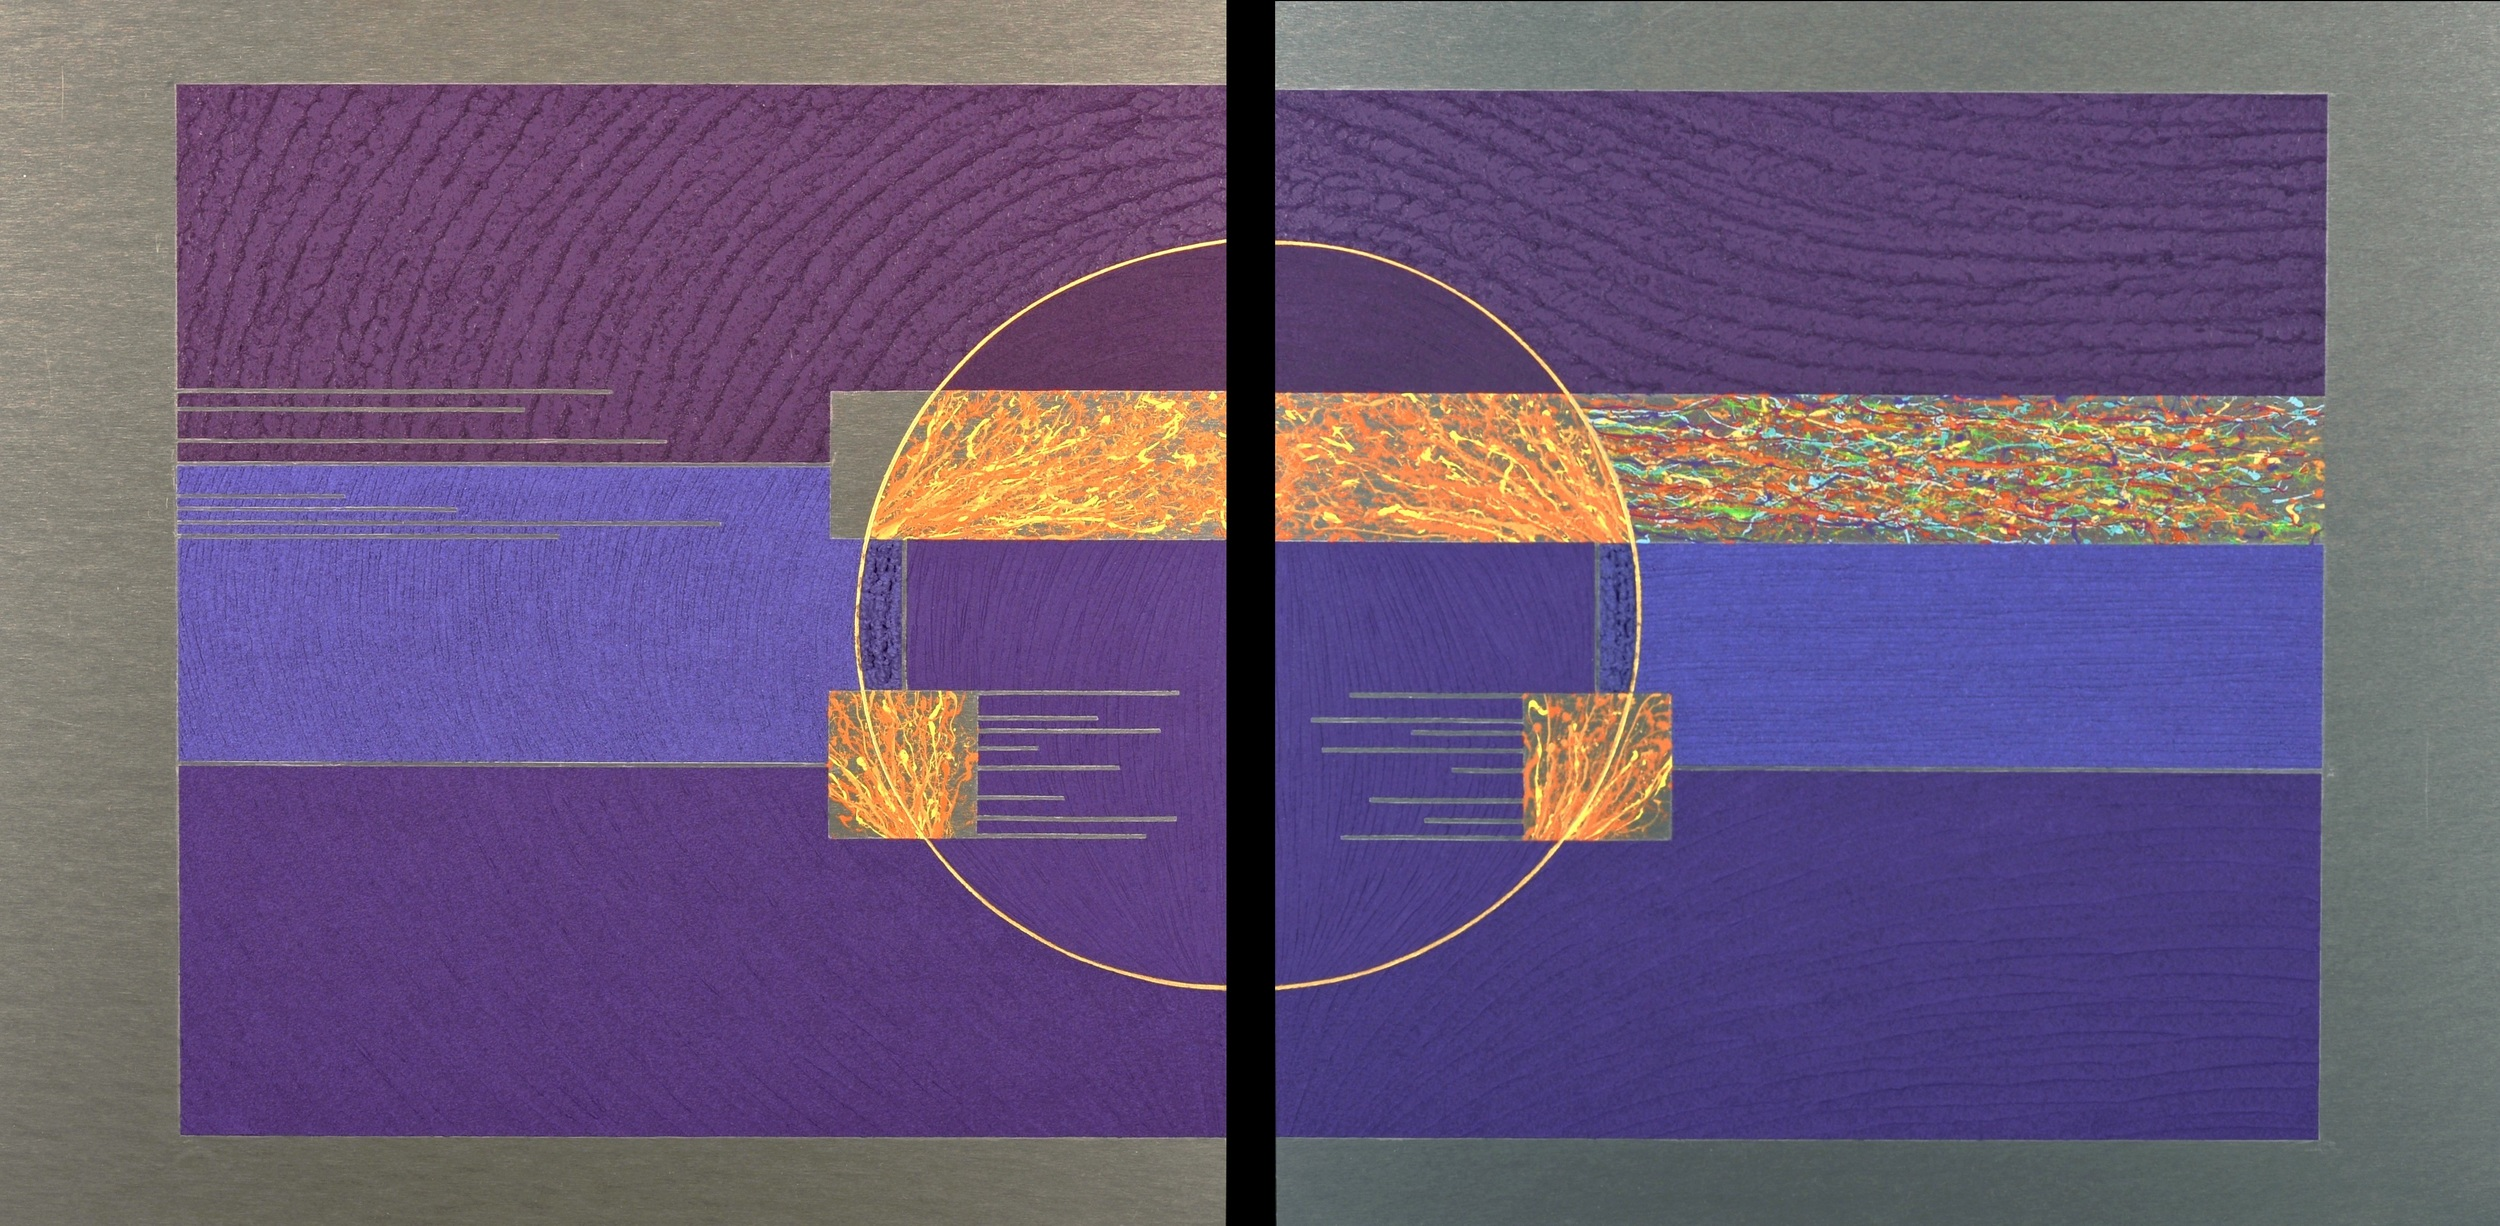 Ensemble (1 et 2).jpg